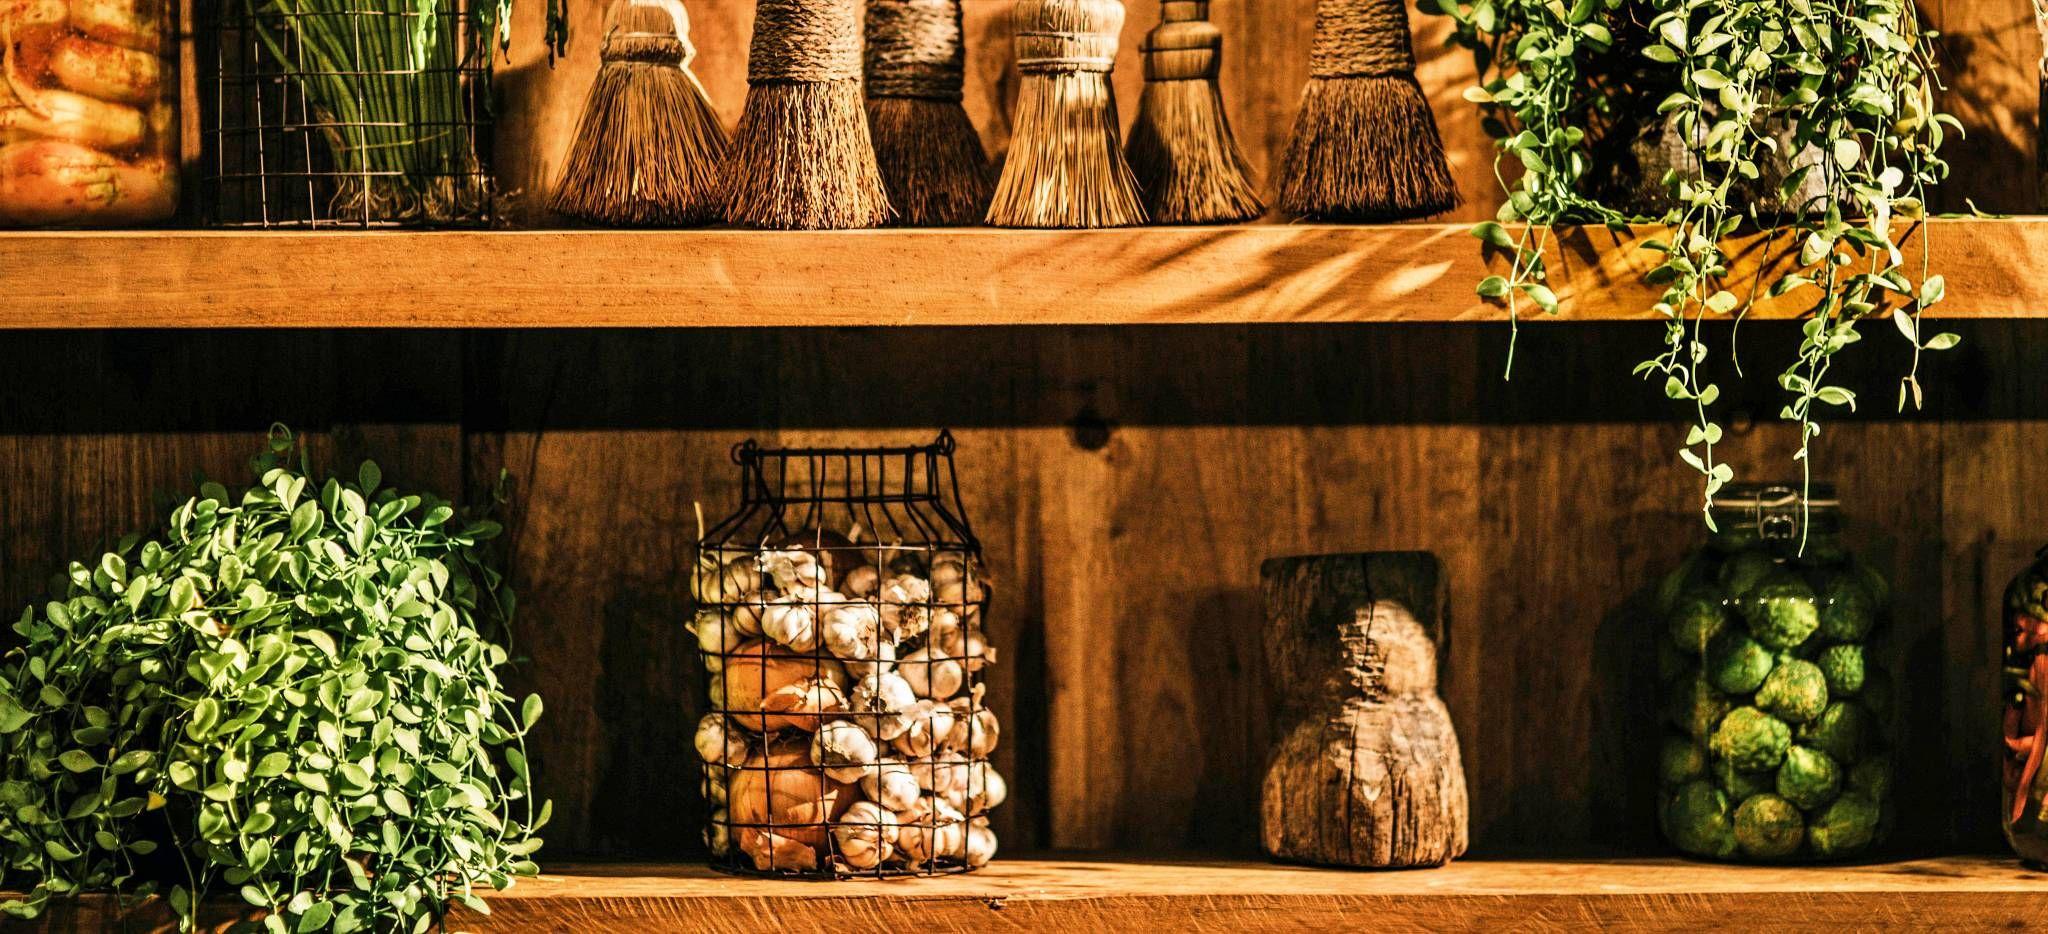 Khmer-Kräuter in einem Regal, Kambodscha